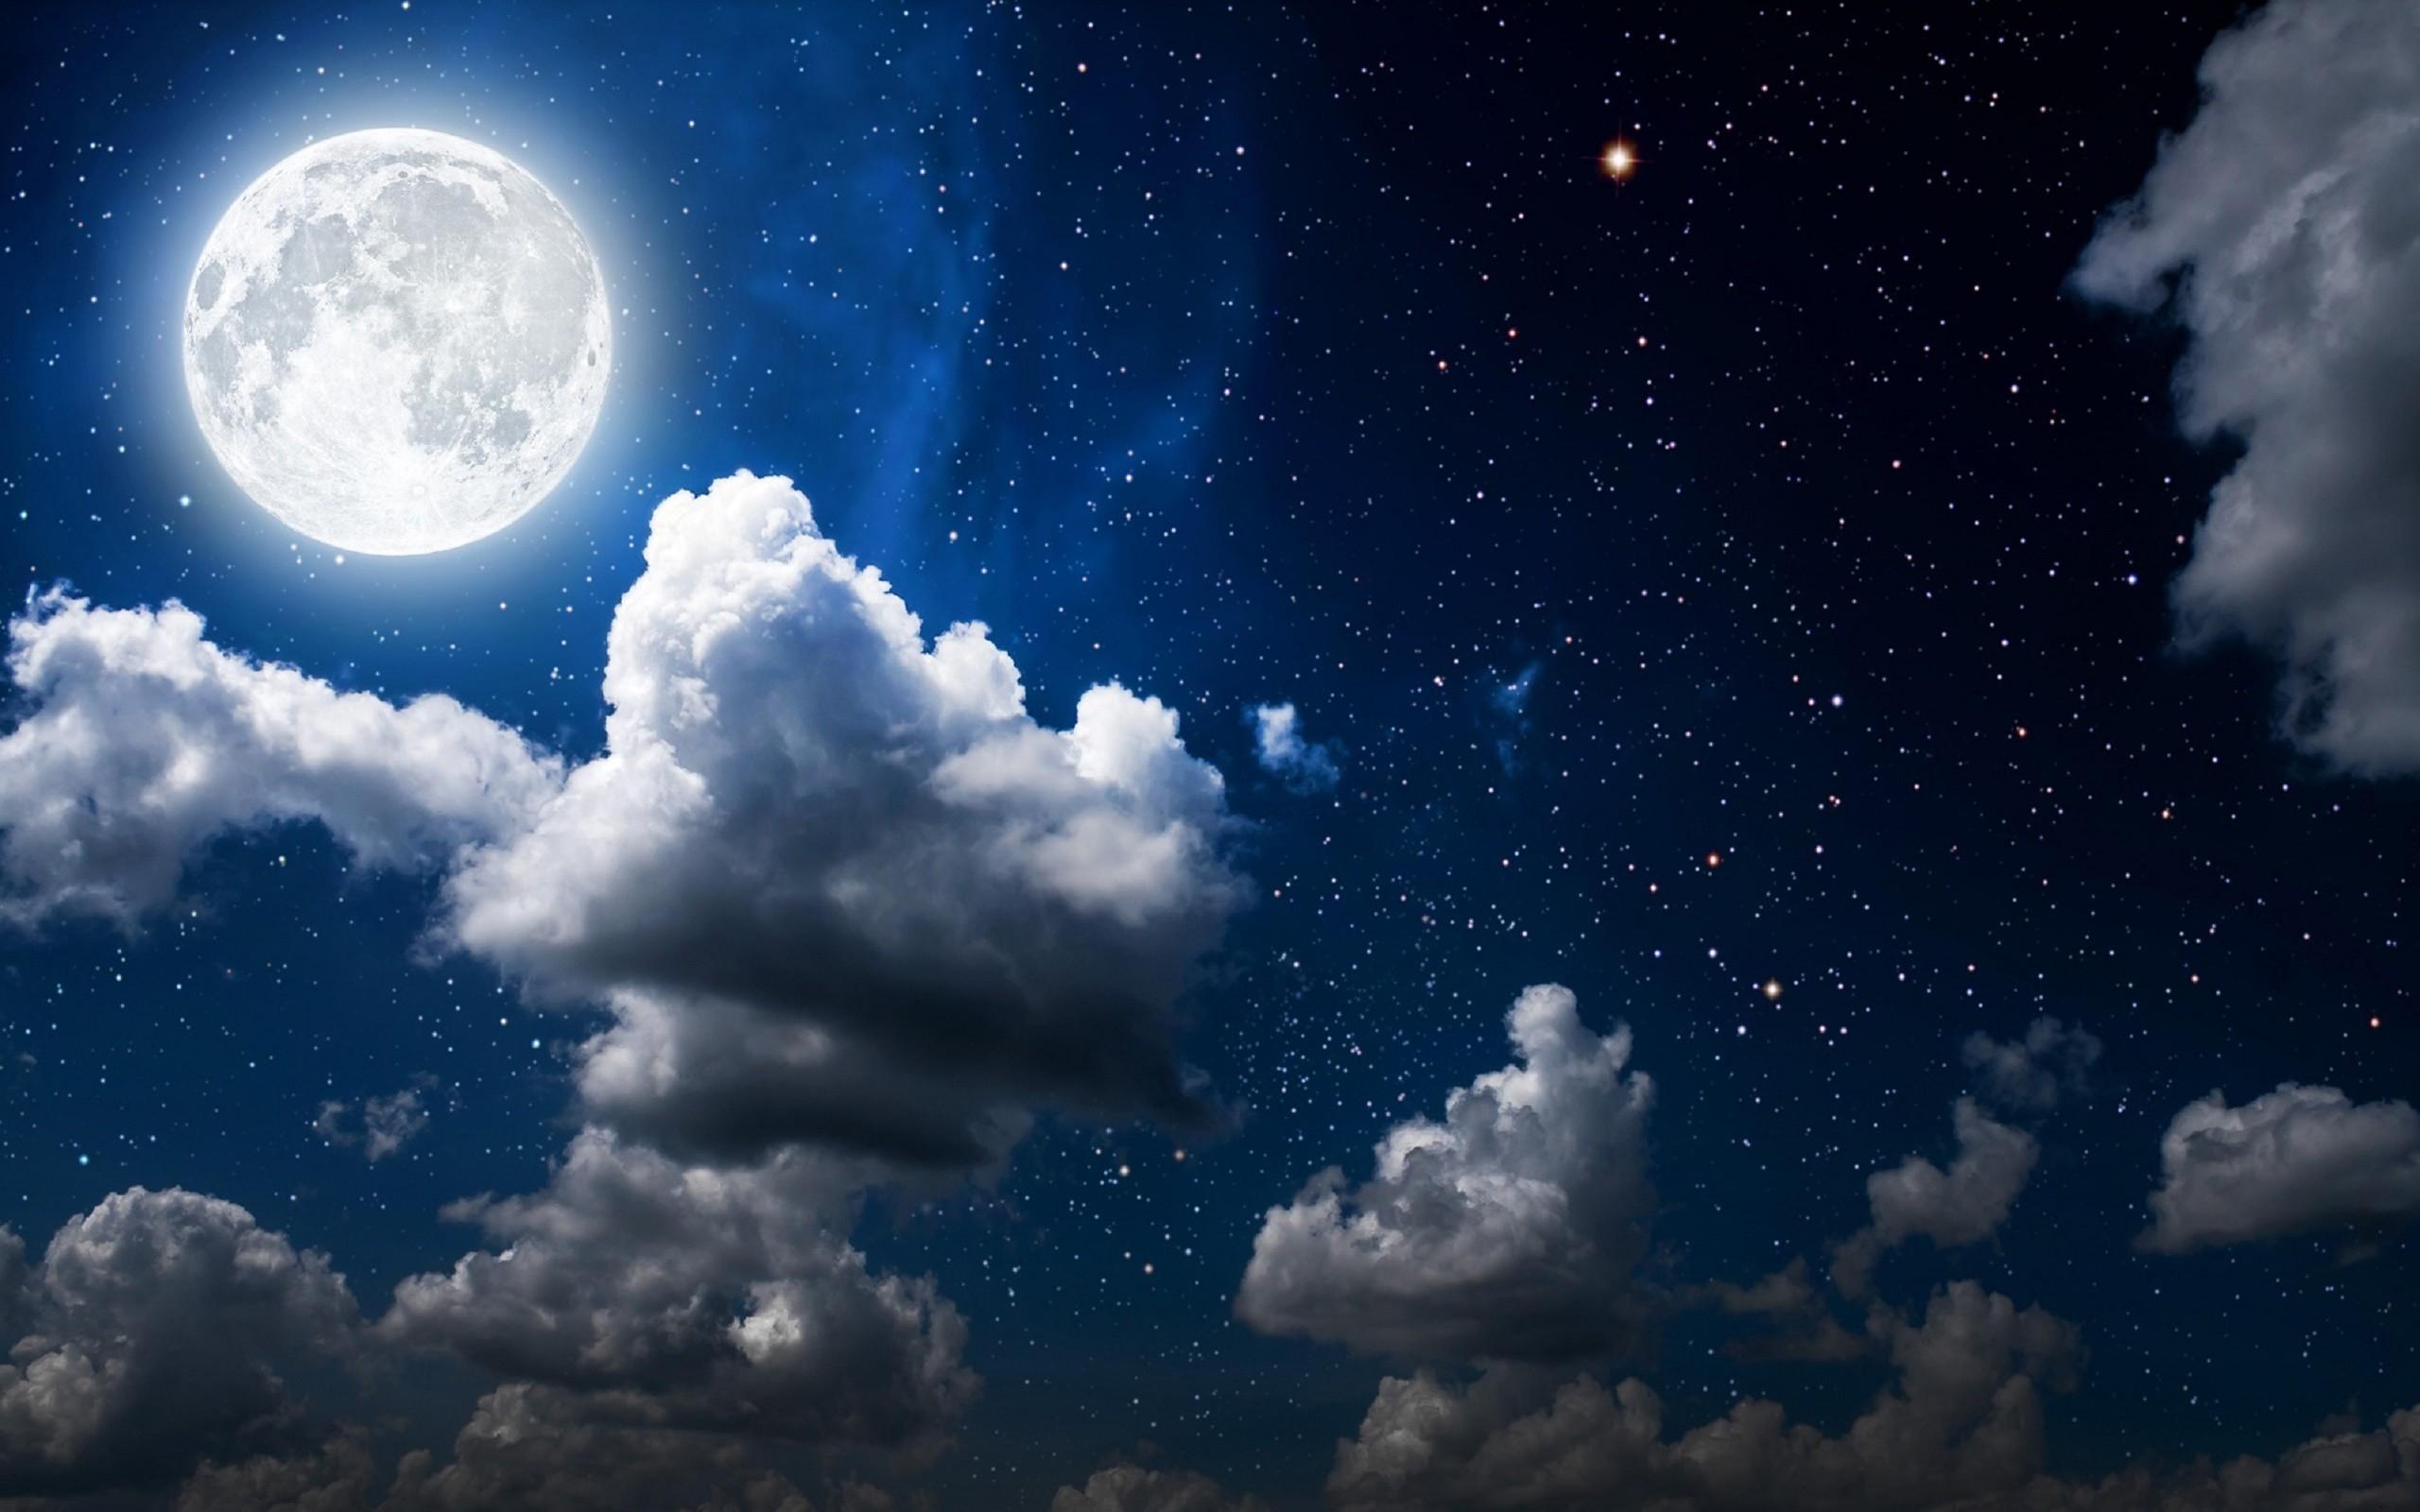 Beautiful 3d Love Wallpapers Moon Clouds Dark Sky Wallpapers Hd Wallpapers Id 18374